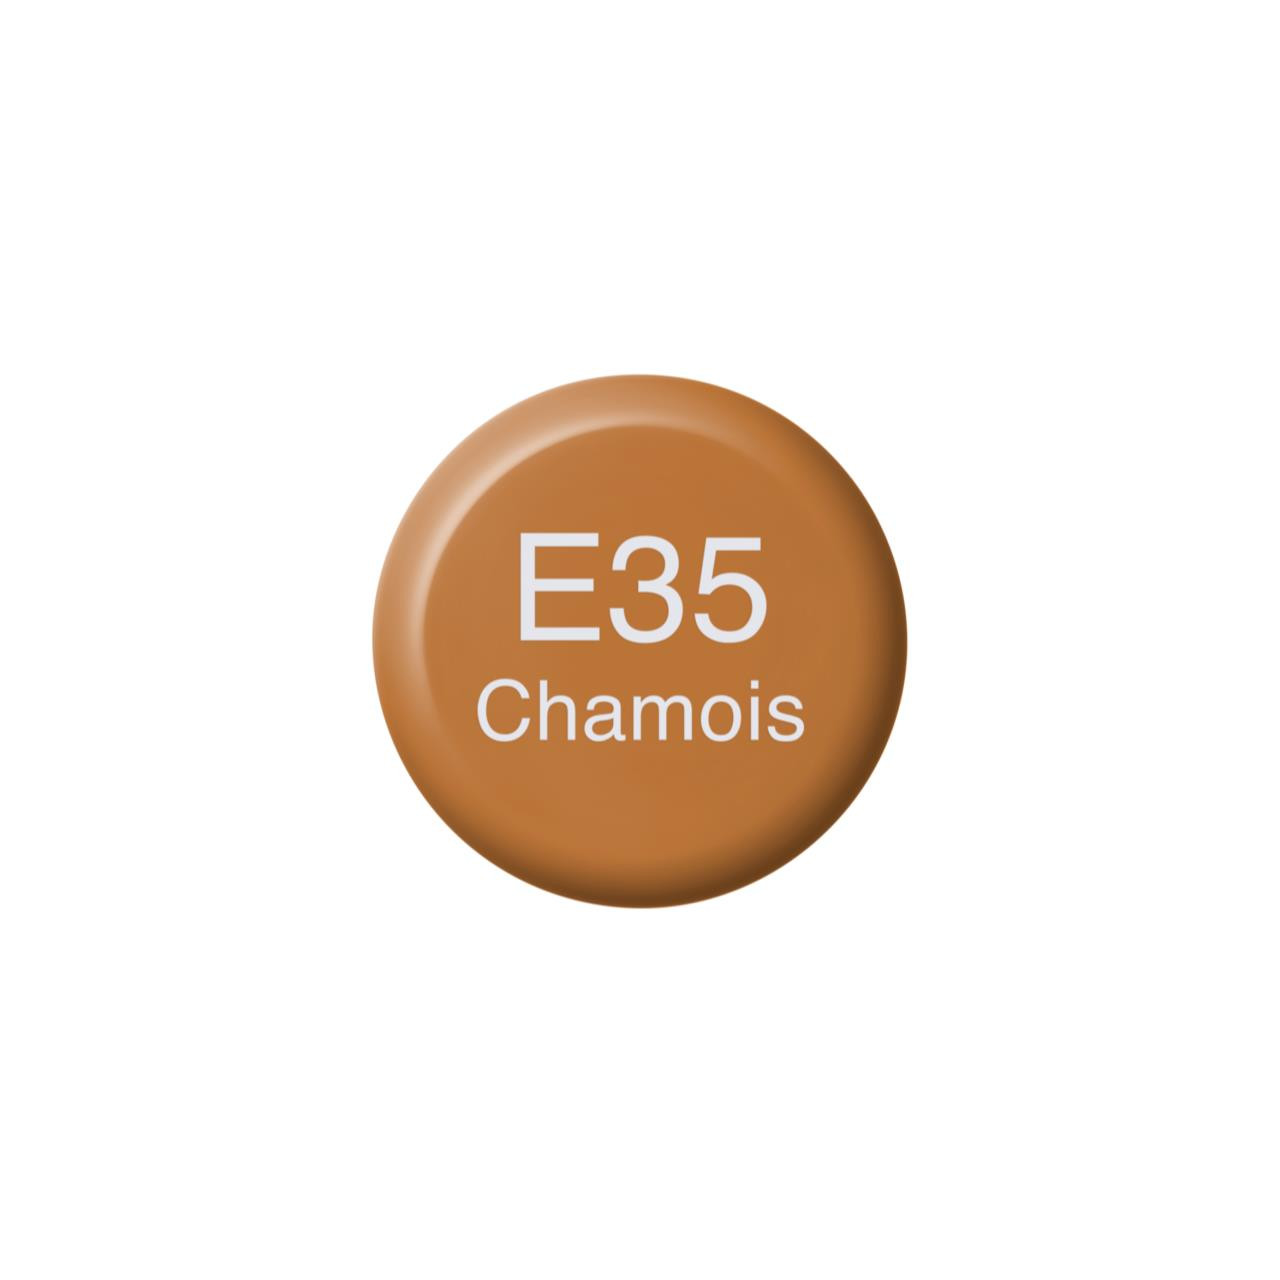 E35 Chamois, Copic Ink - 4511338056820